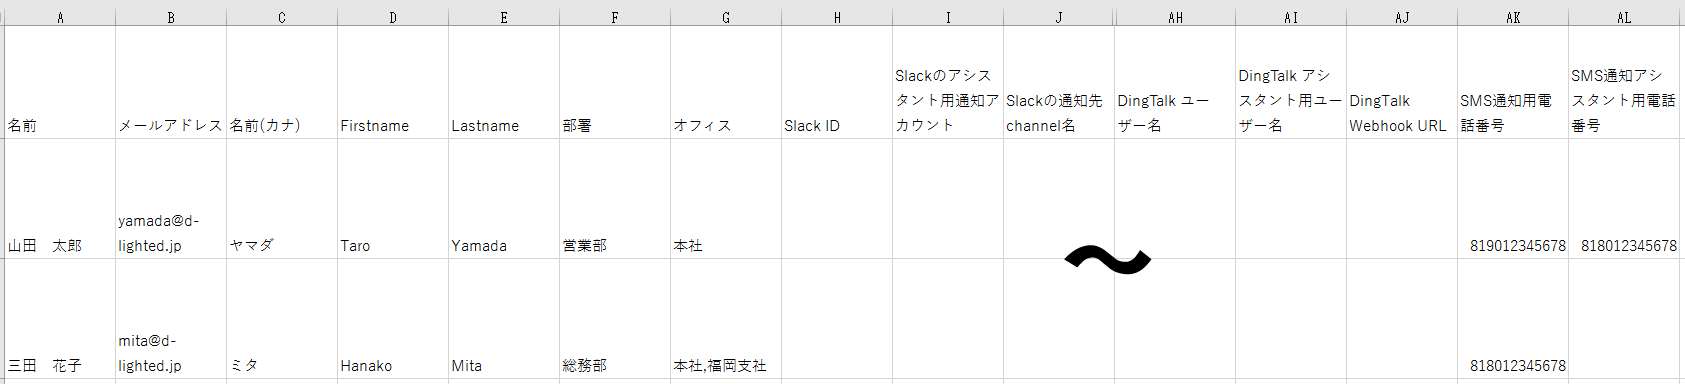 sample_epcsv_SMS